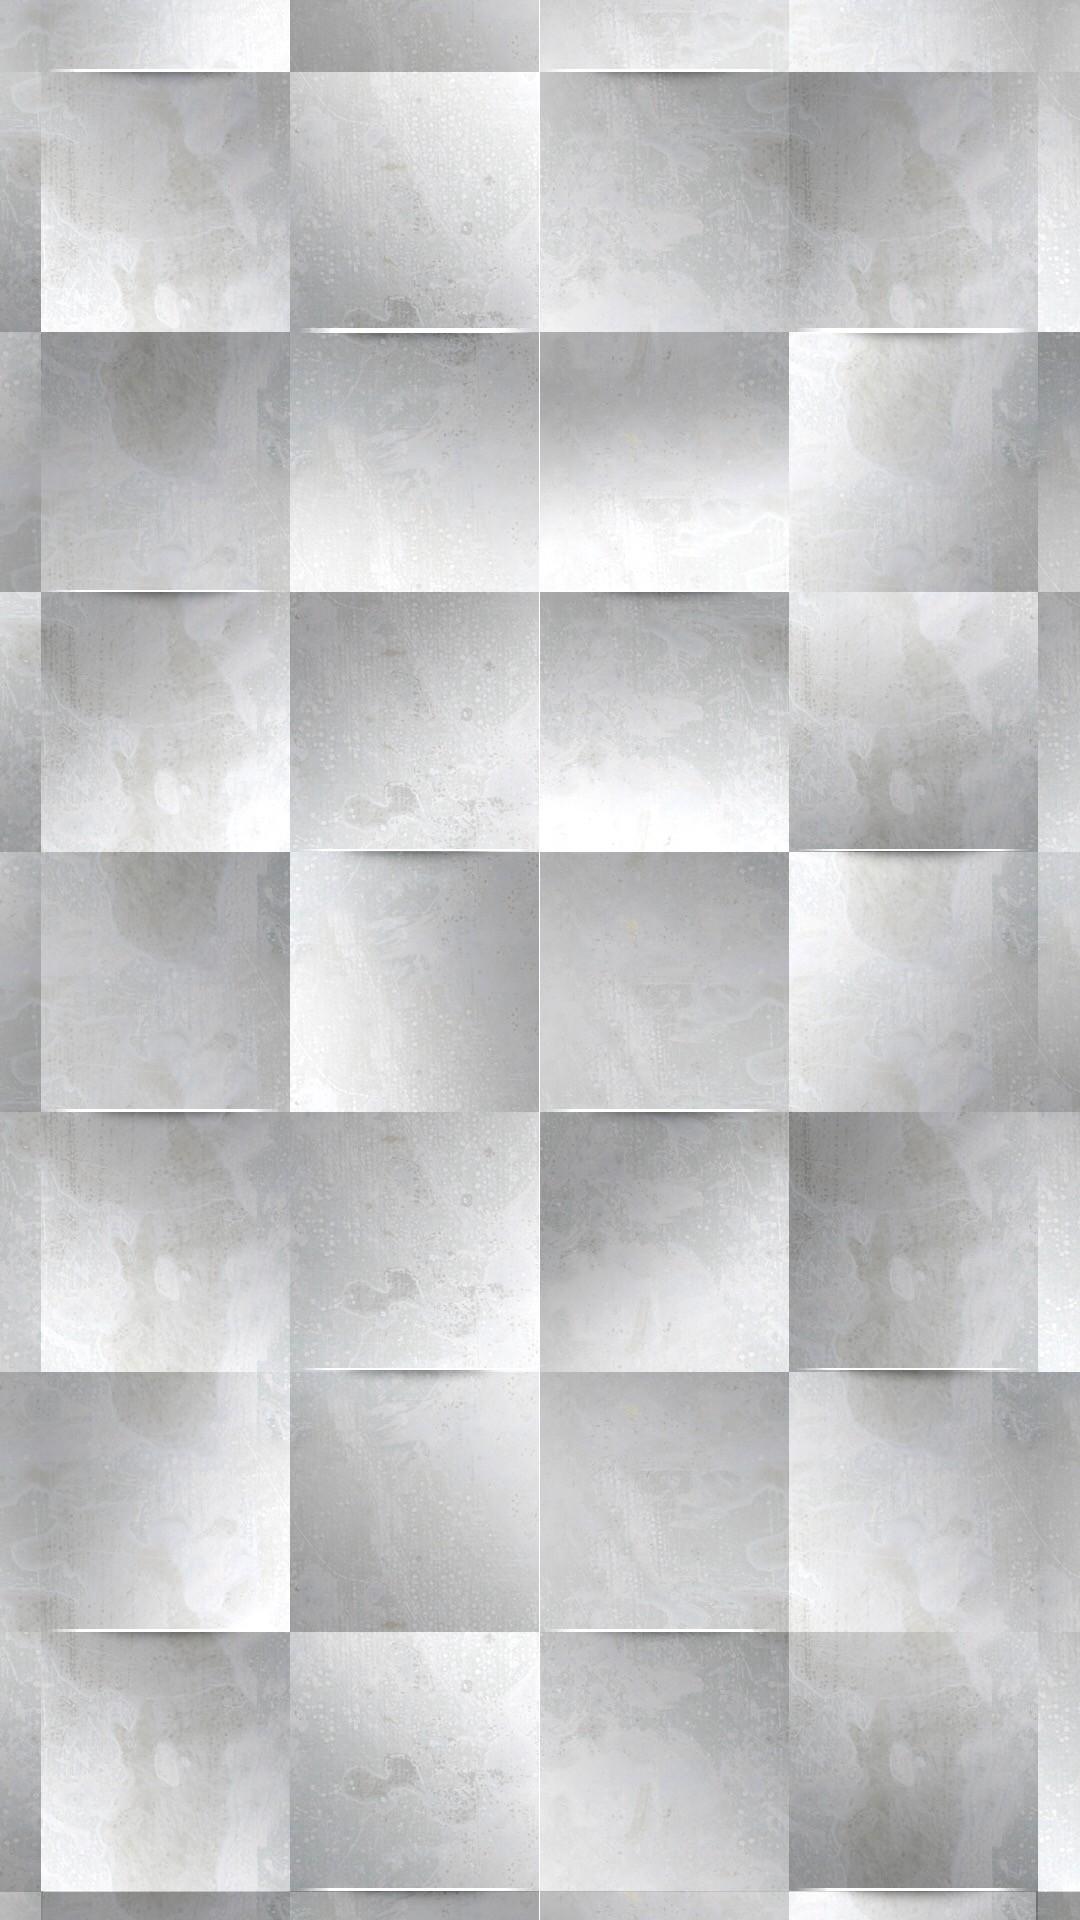 Iphone 6 Shelf Wallpaper 91 Images